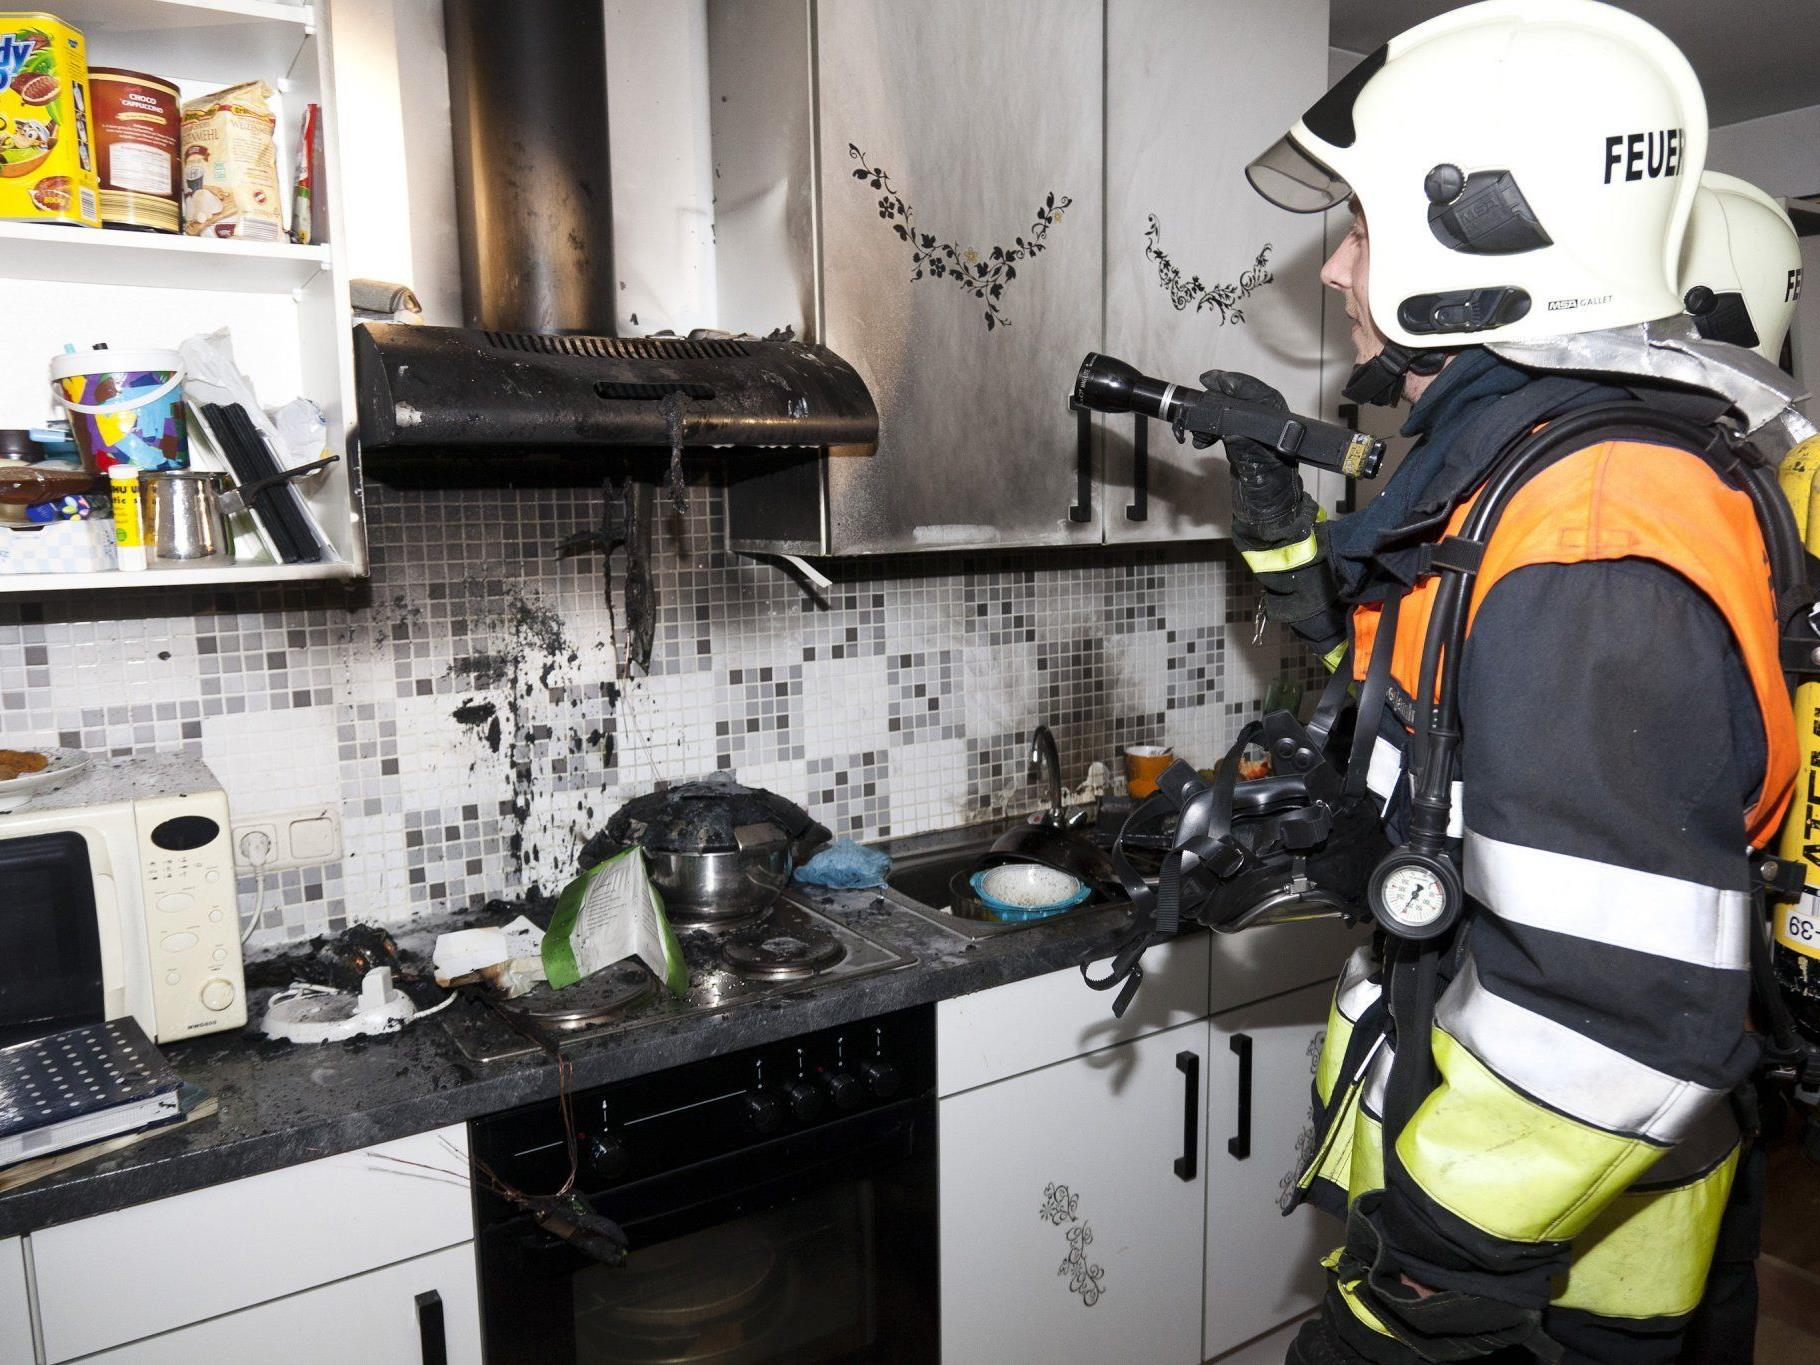 Kochtopf geriet in Brand